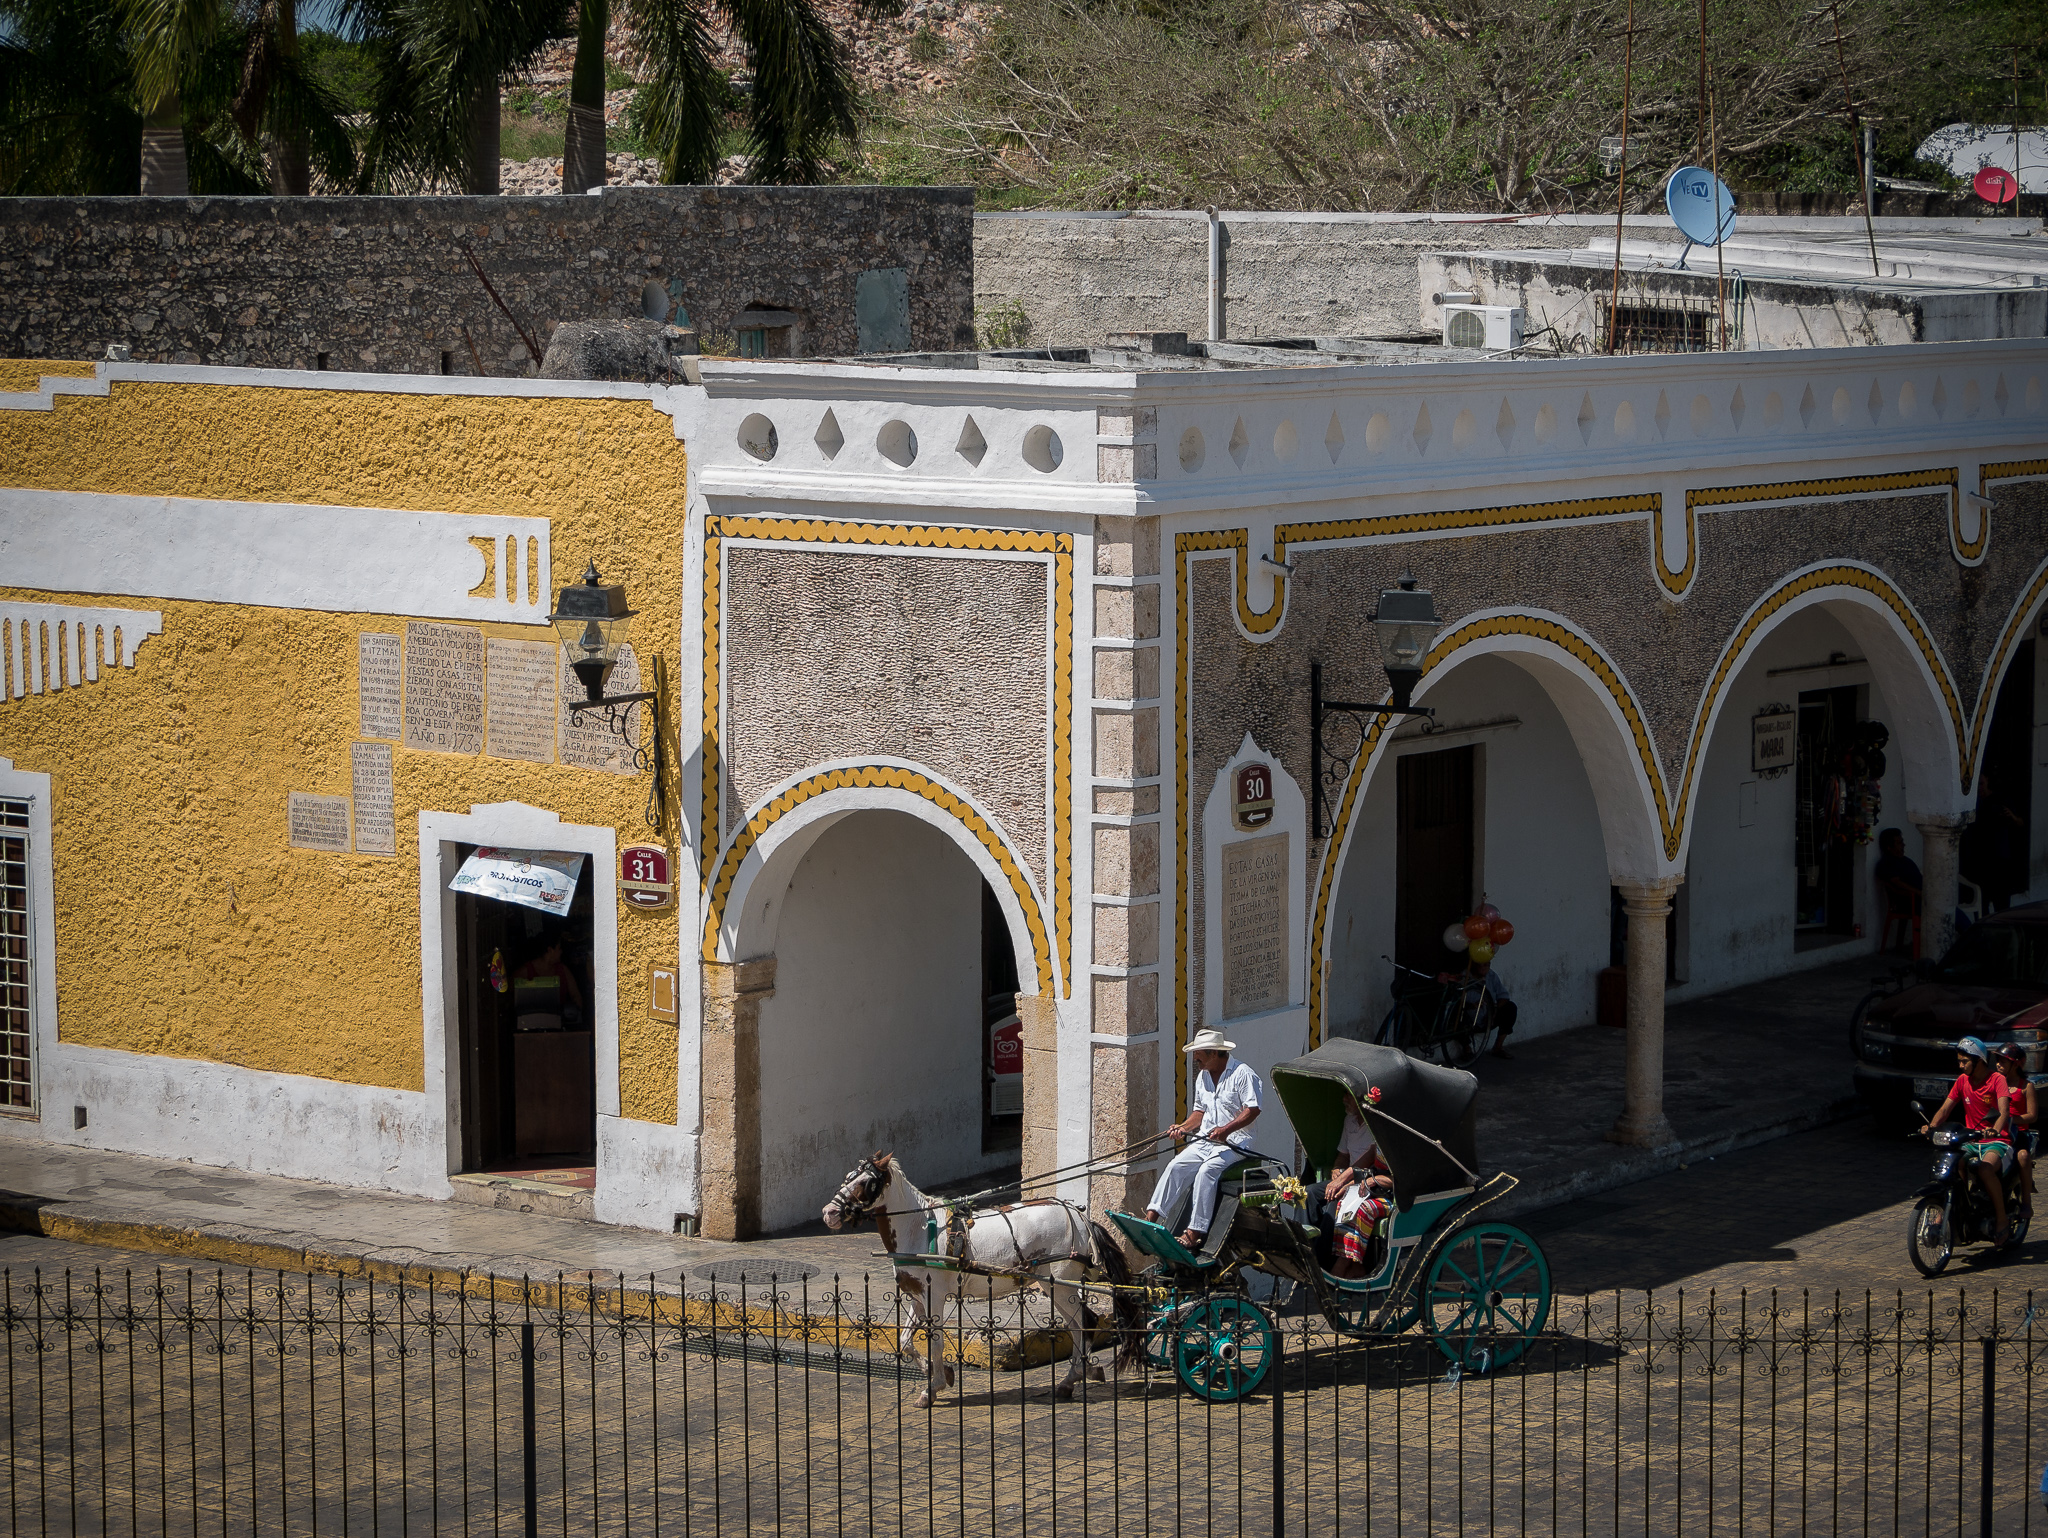 Horse and Carriage, Izamal